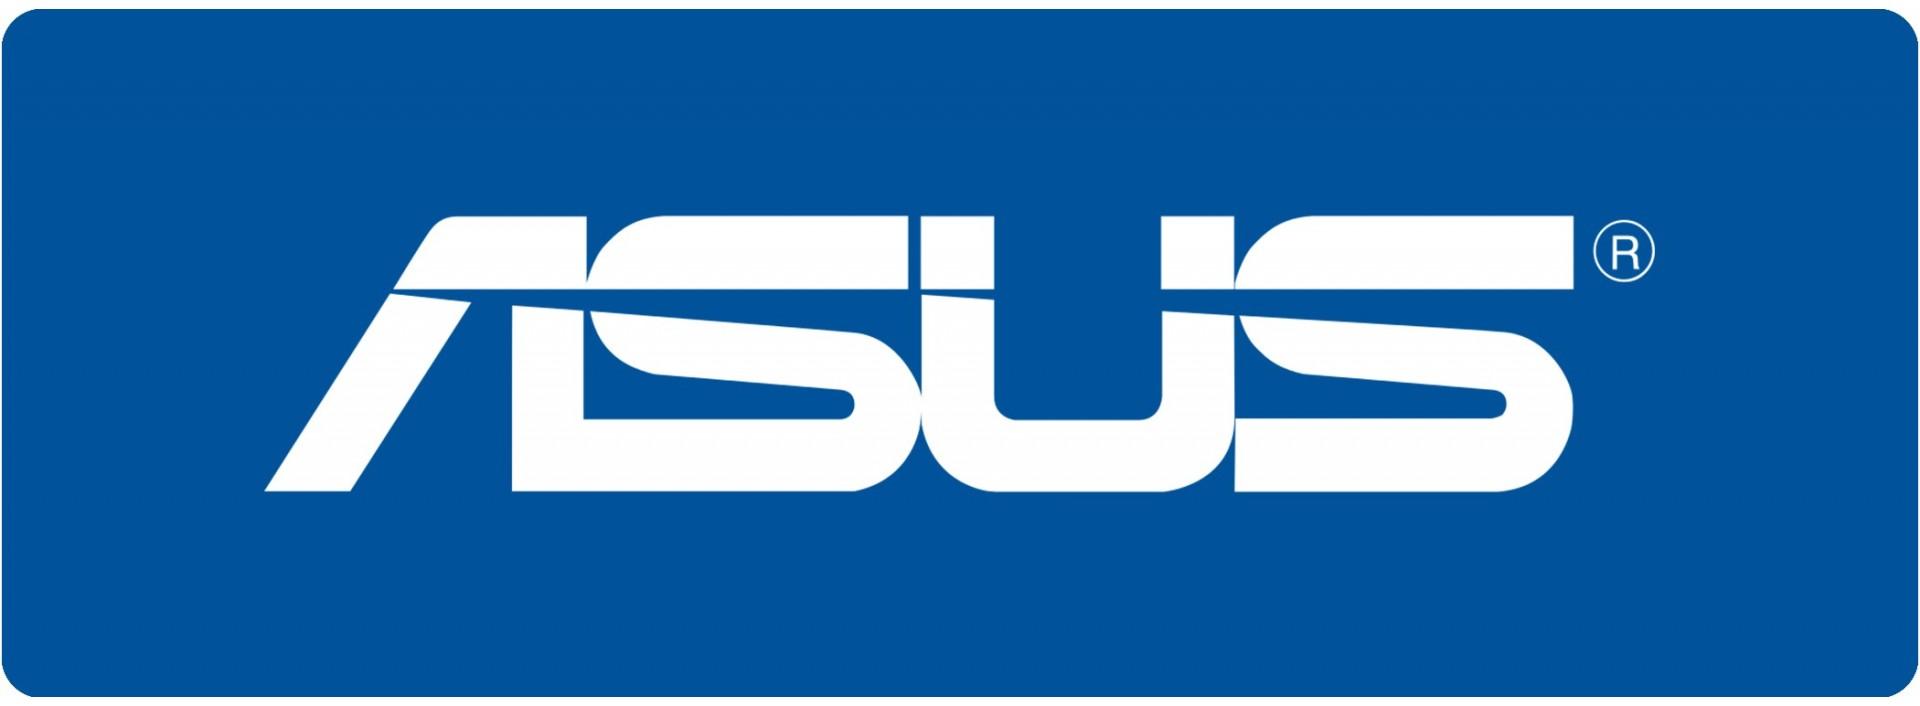 Fundas para Asus | TuMundoSmartphone | Envio Gratis